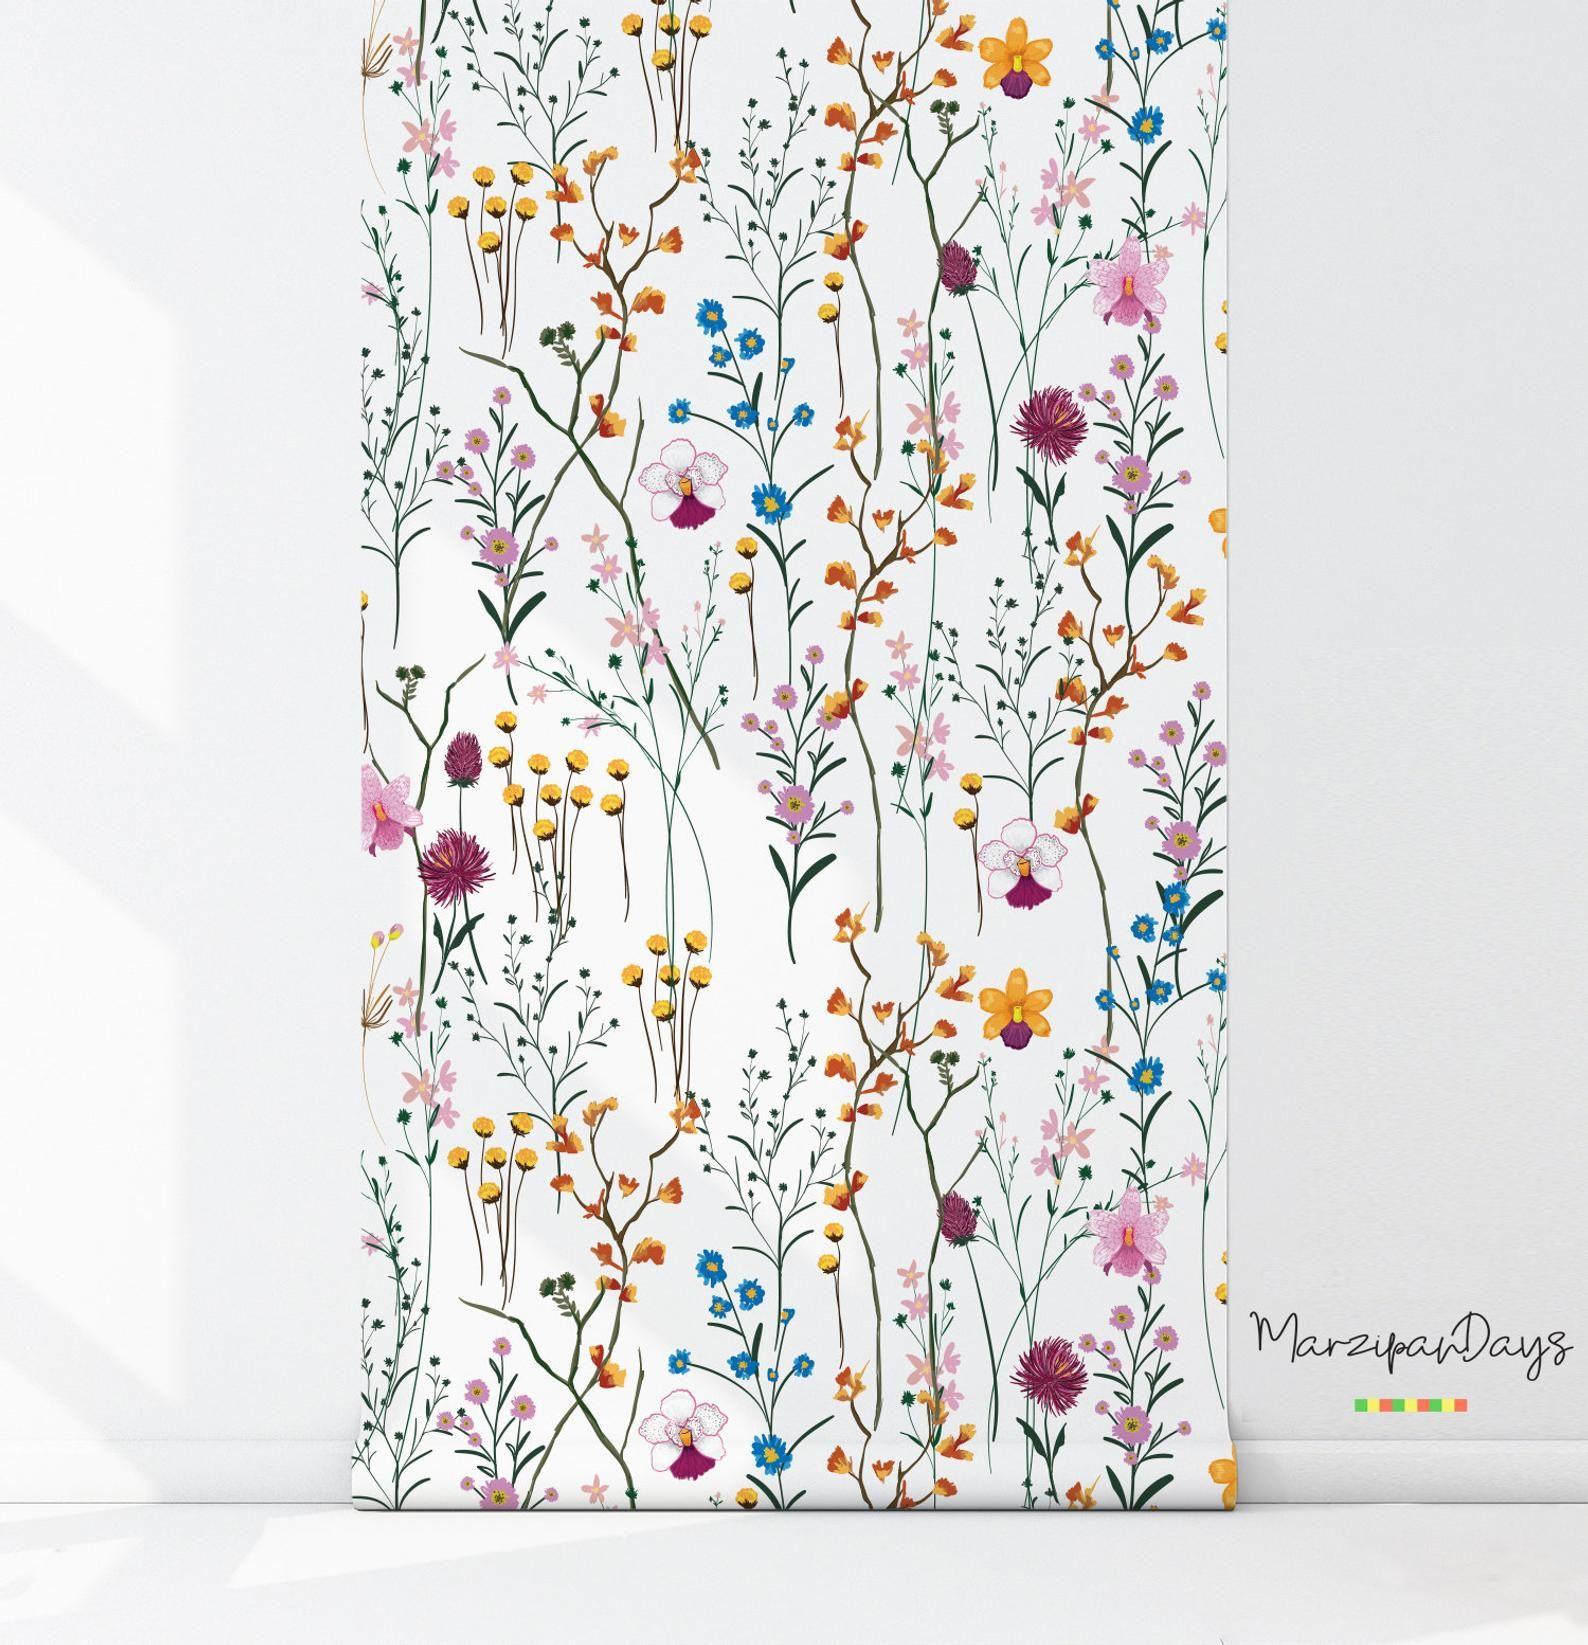 WIld flowers removable wallpaper Garden flowers wall